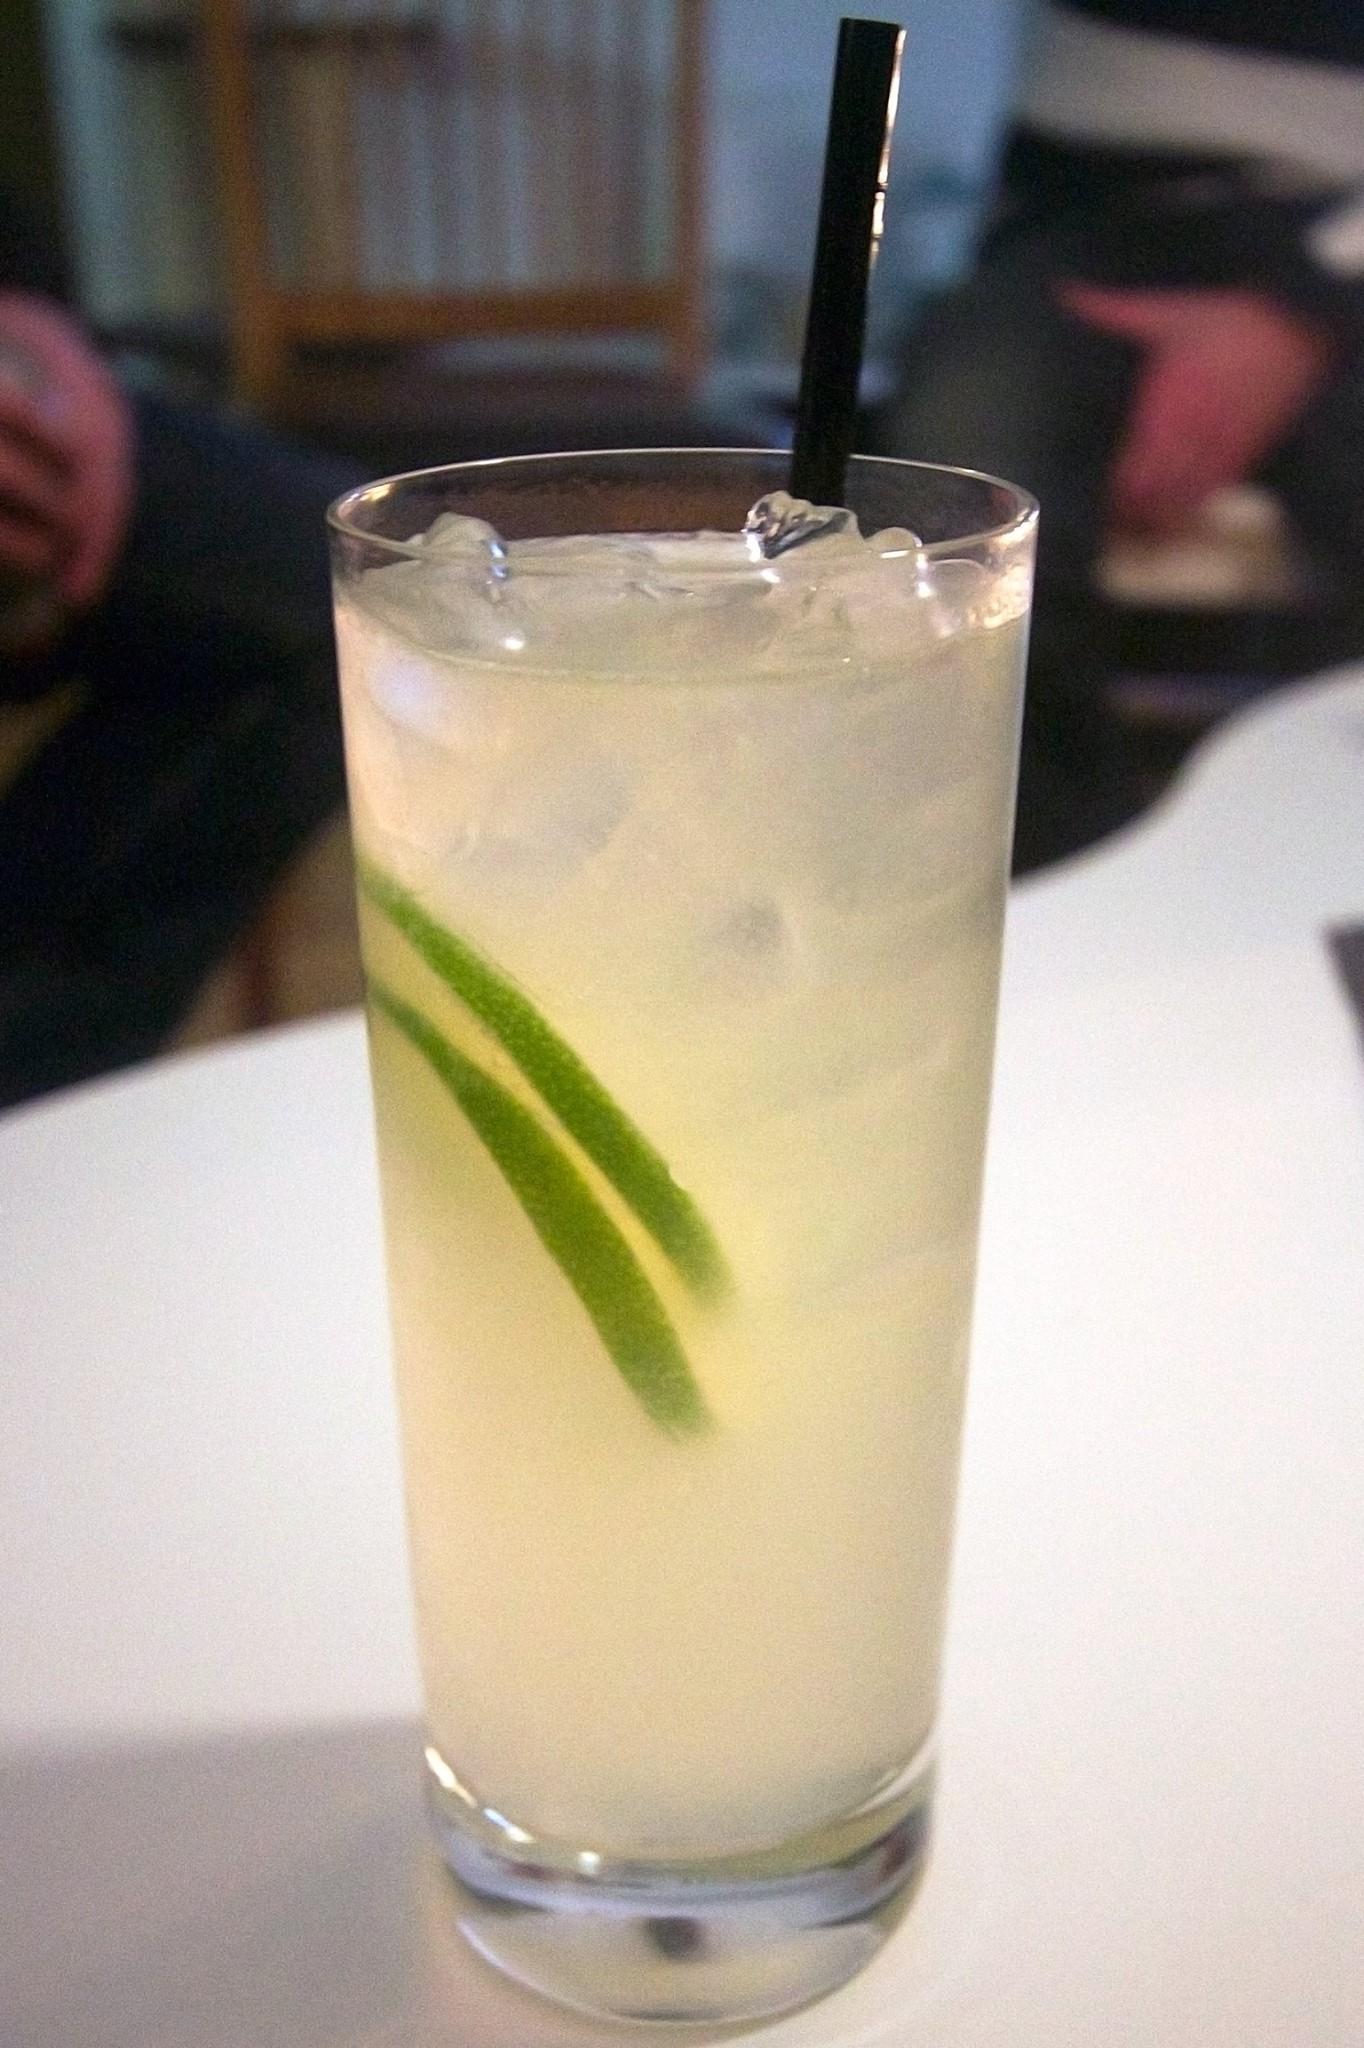 Den enkla & otroligt läskande drinken Moscow Mule